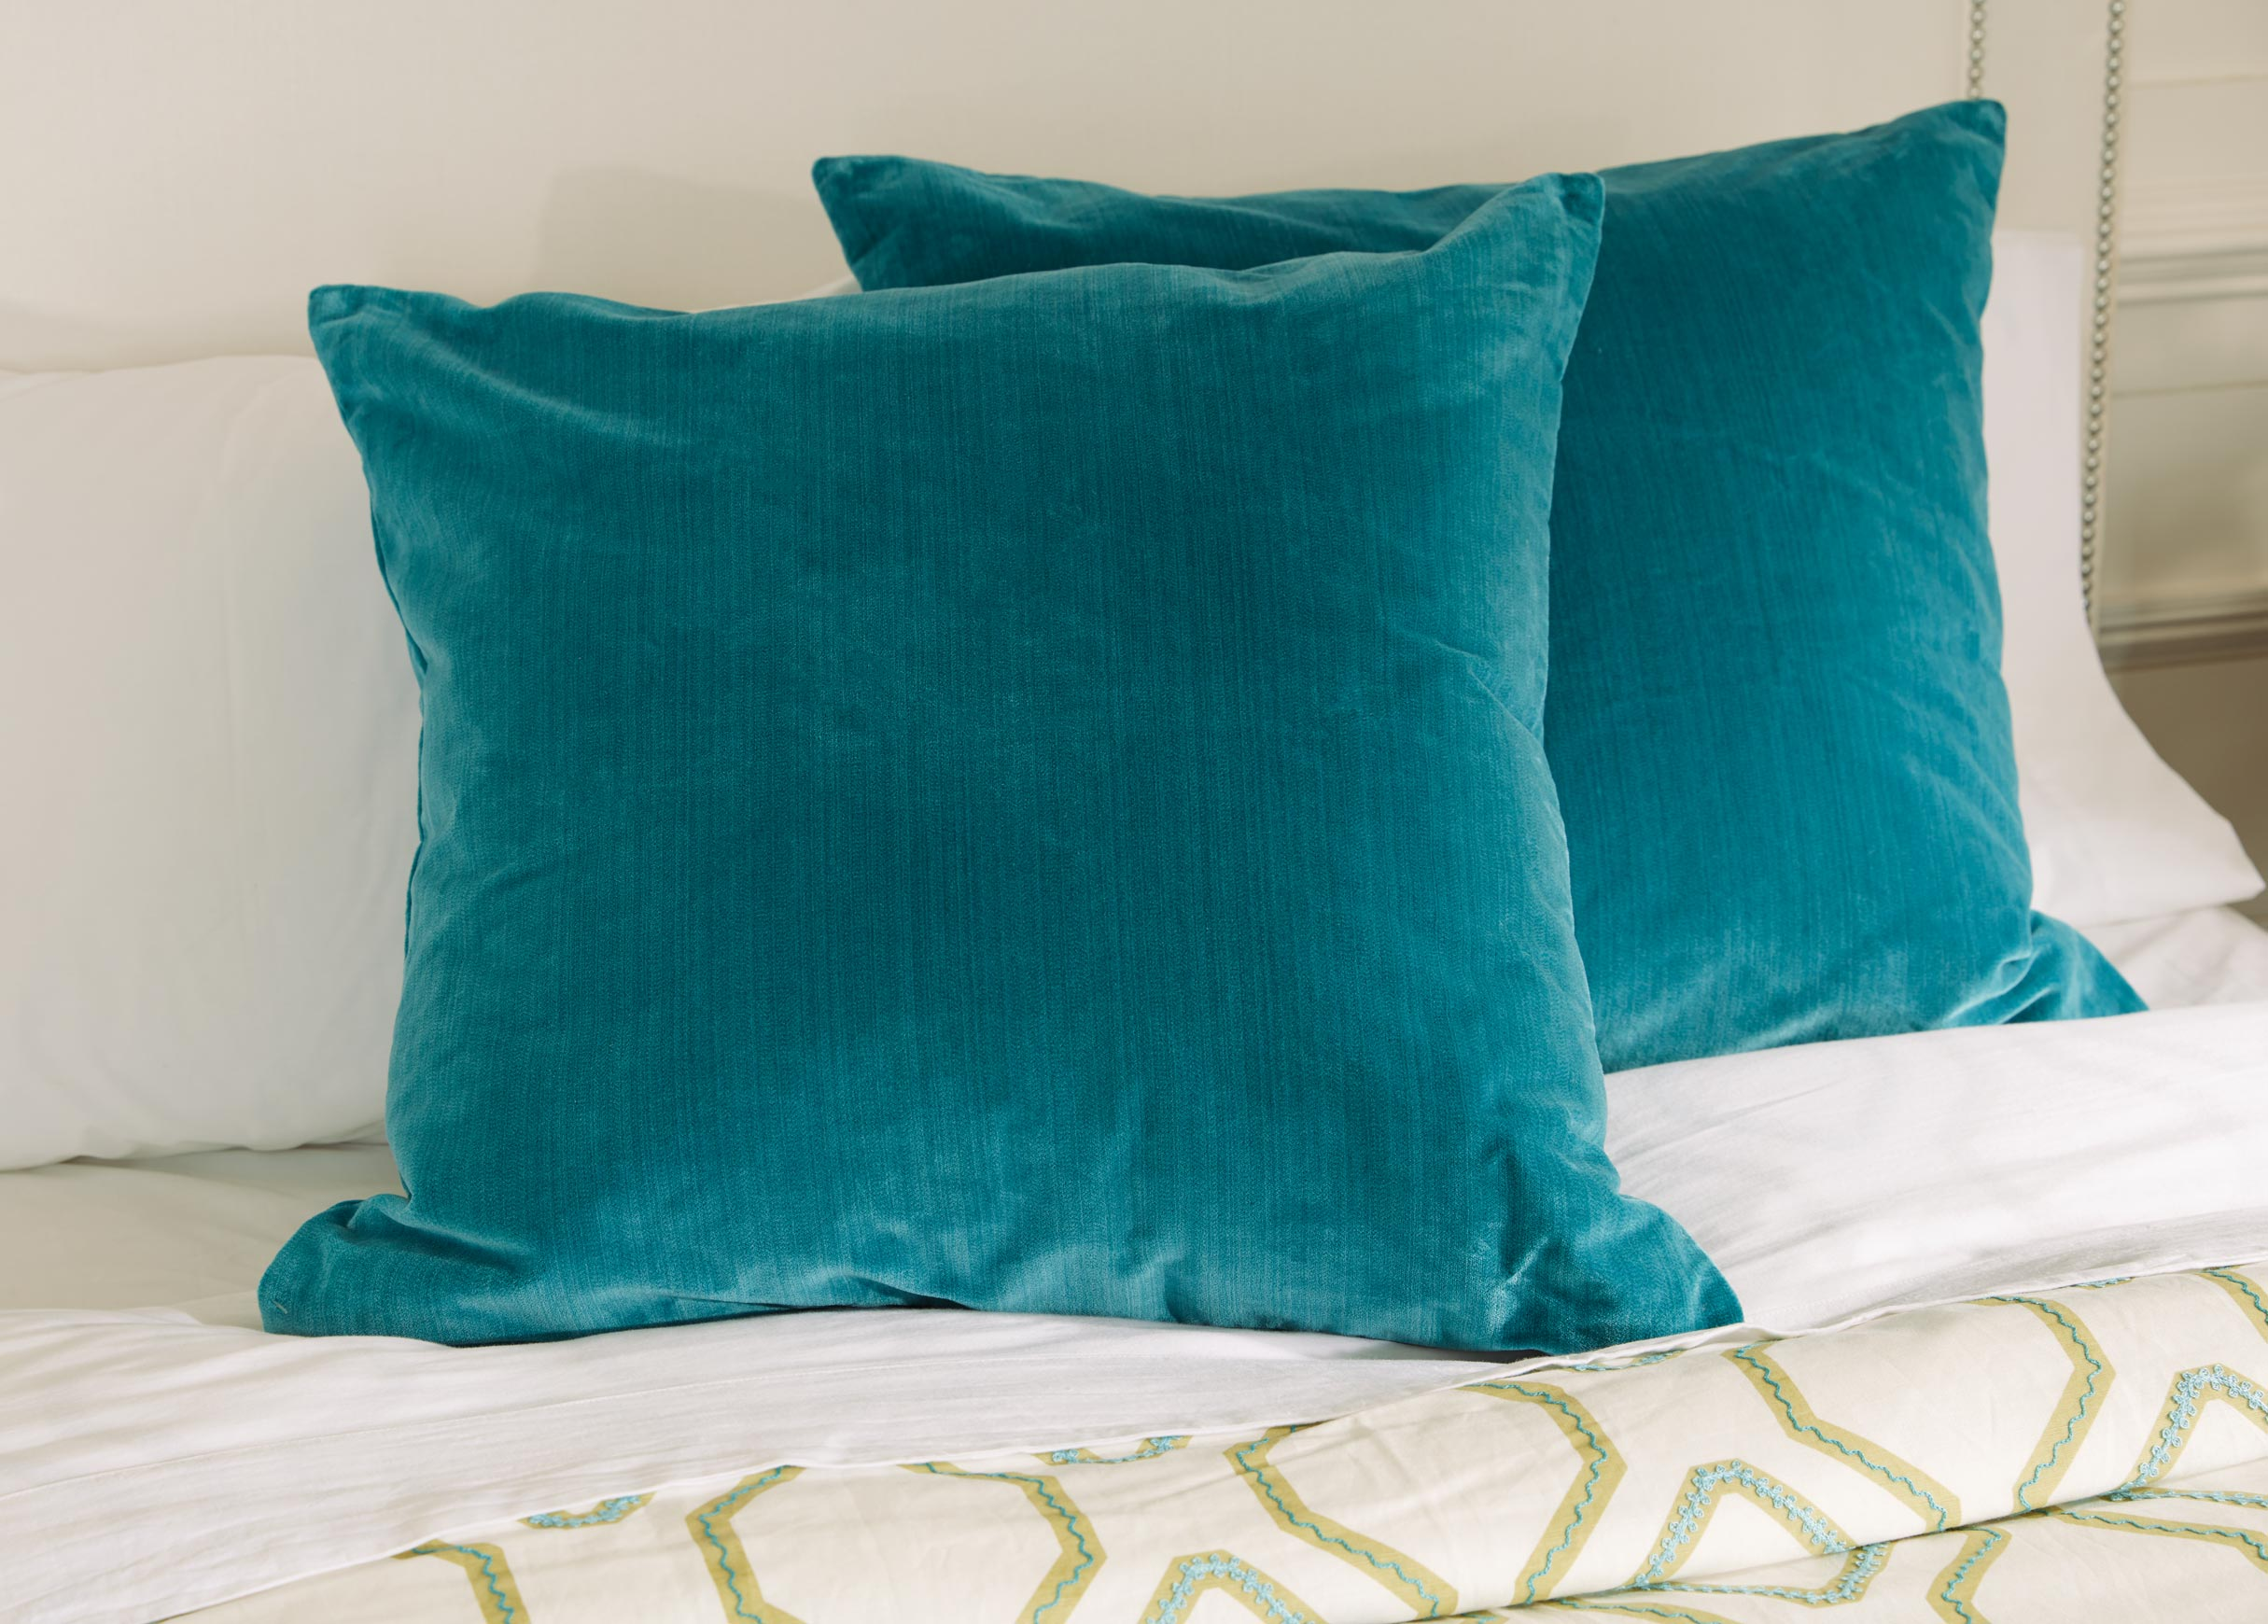 Velvet Strie Euro Sham Pillow And Lumbar Pillow Ethan